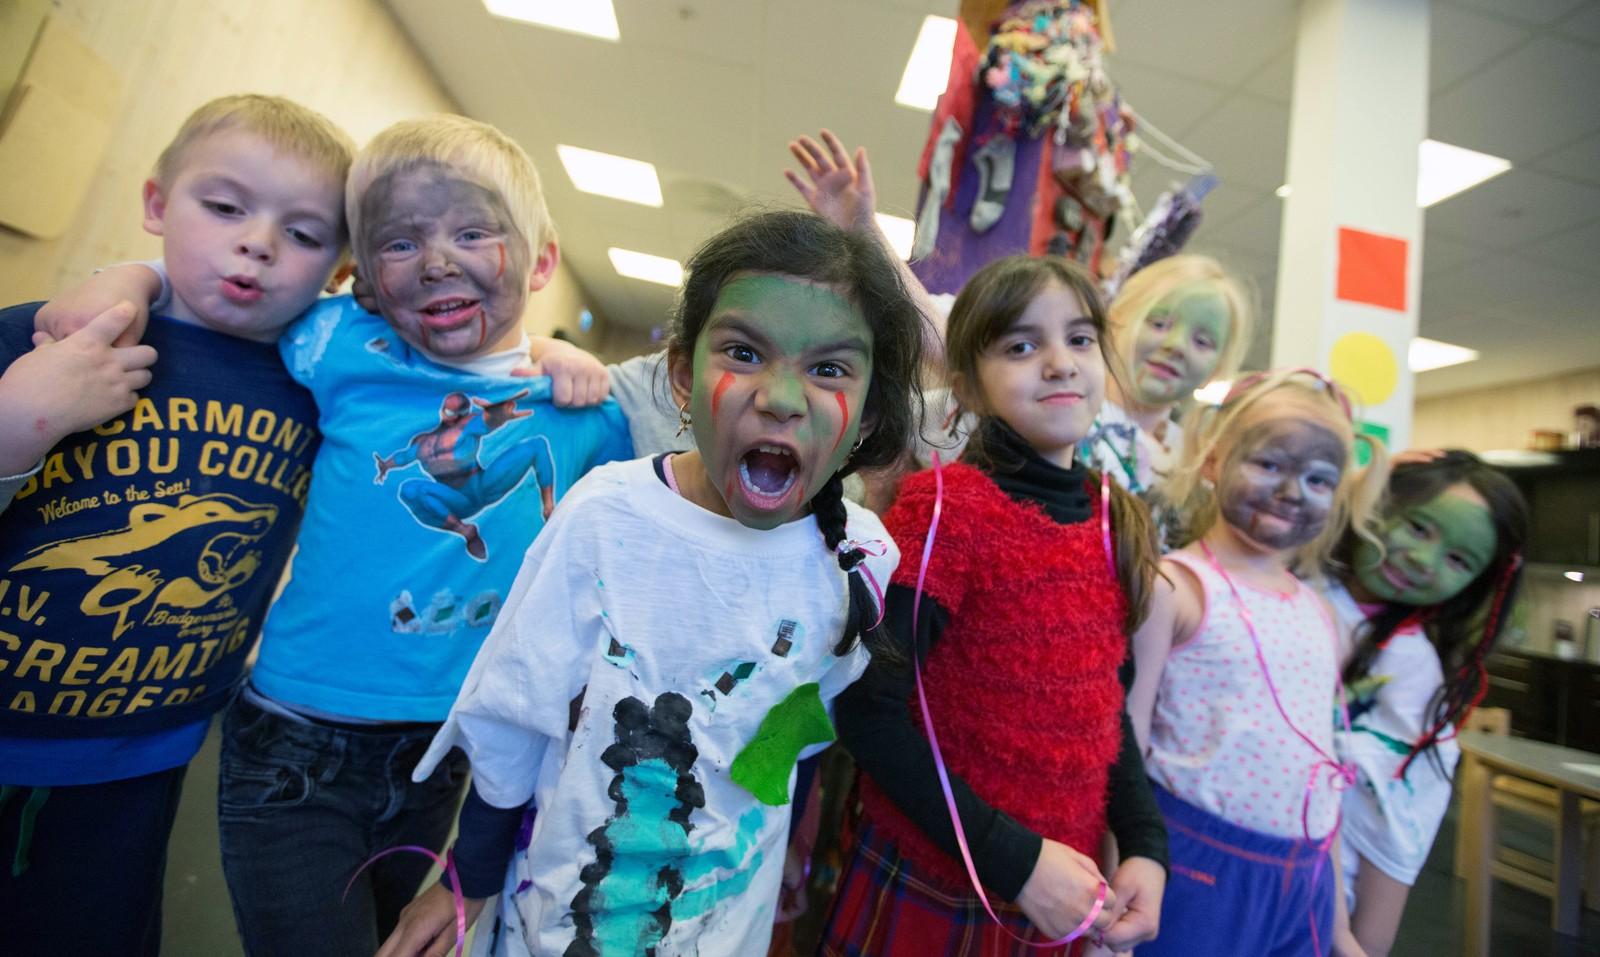 Monsterbrølene er mange i Jåttå barnehage i dag. (Fra venstre: William J. Torsnes, Leo Houland, Sadhana Moharshaker, Rama O. A. Al-Azaizi, Arndis Sigurdardottir, Nora K. Smevig og Hannah Vadner.)